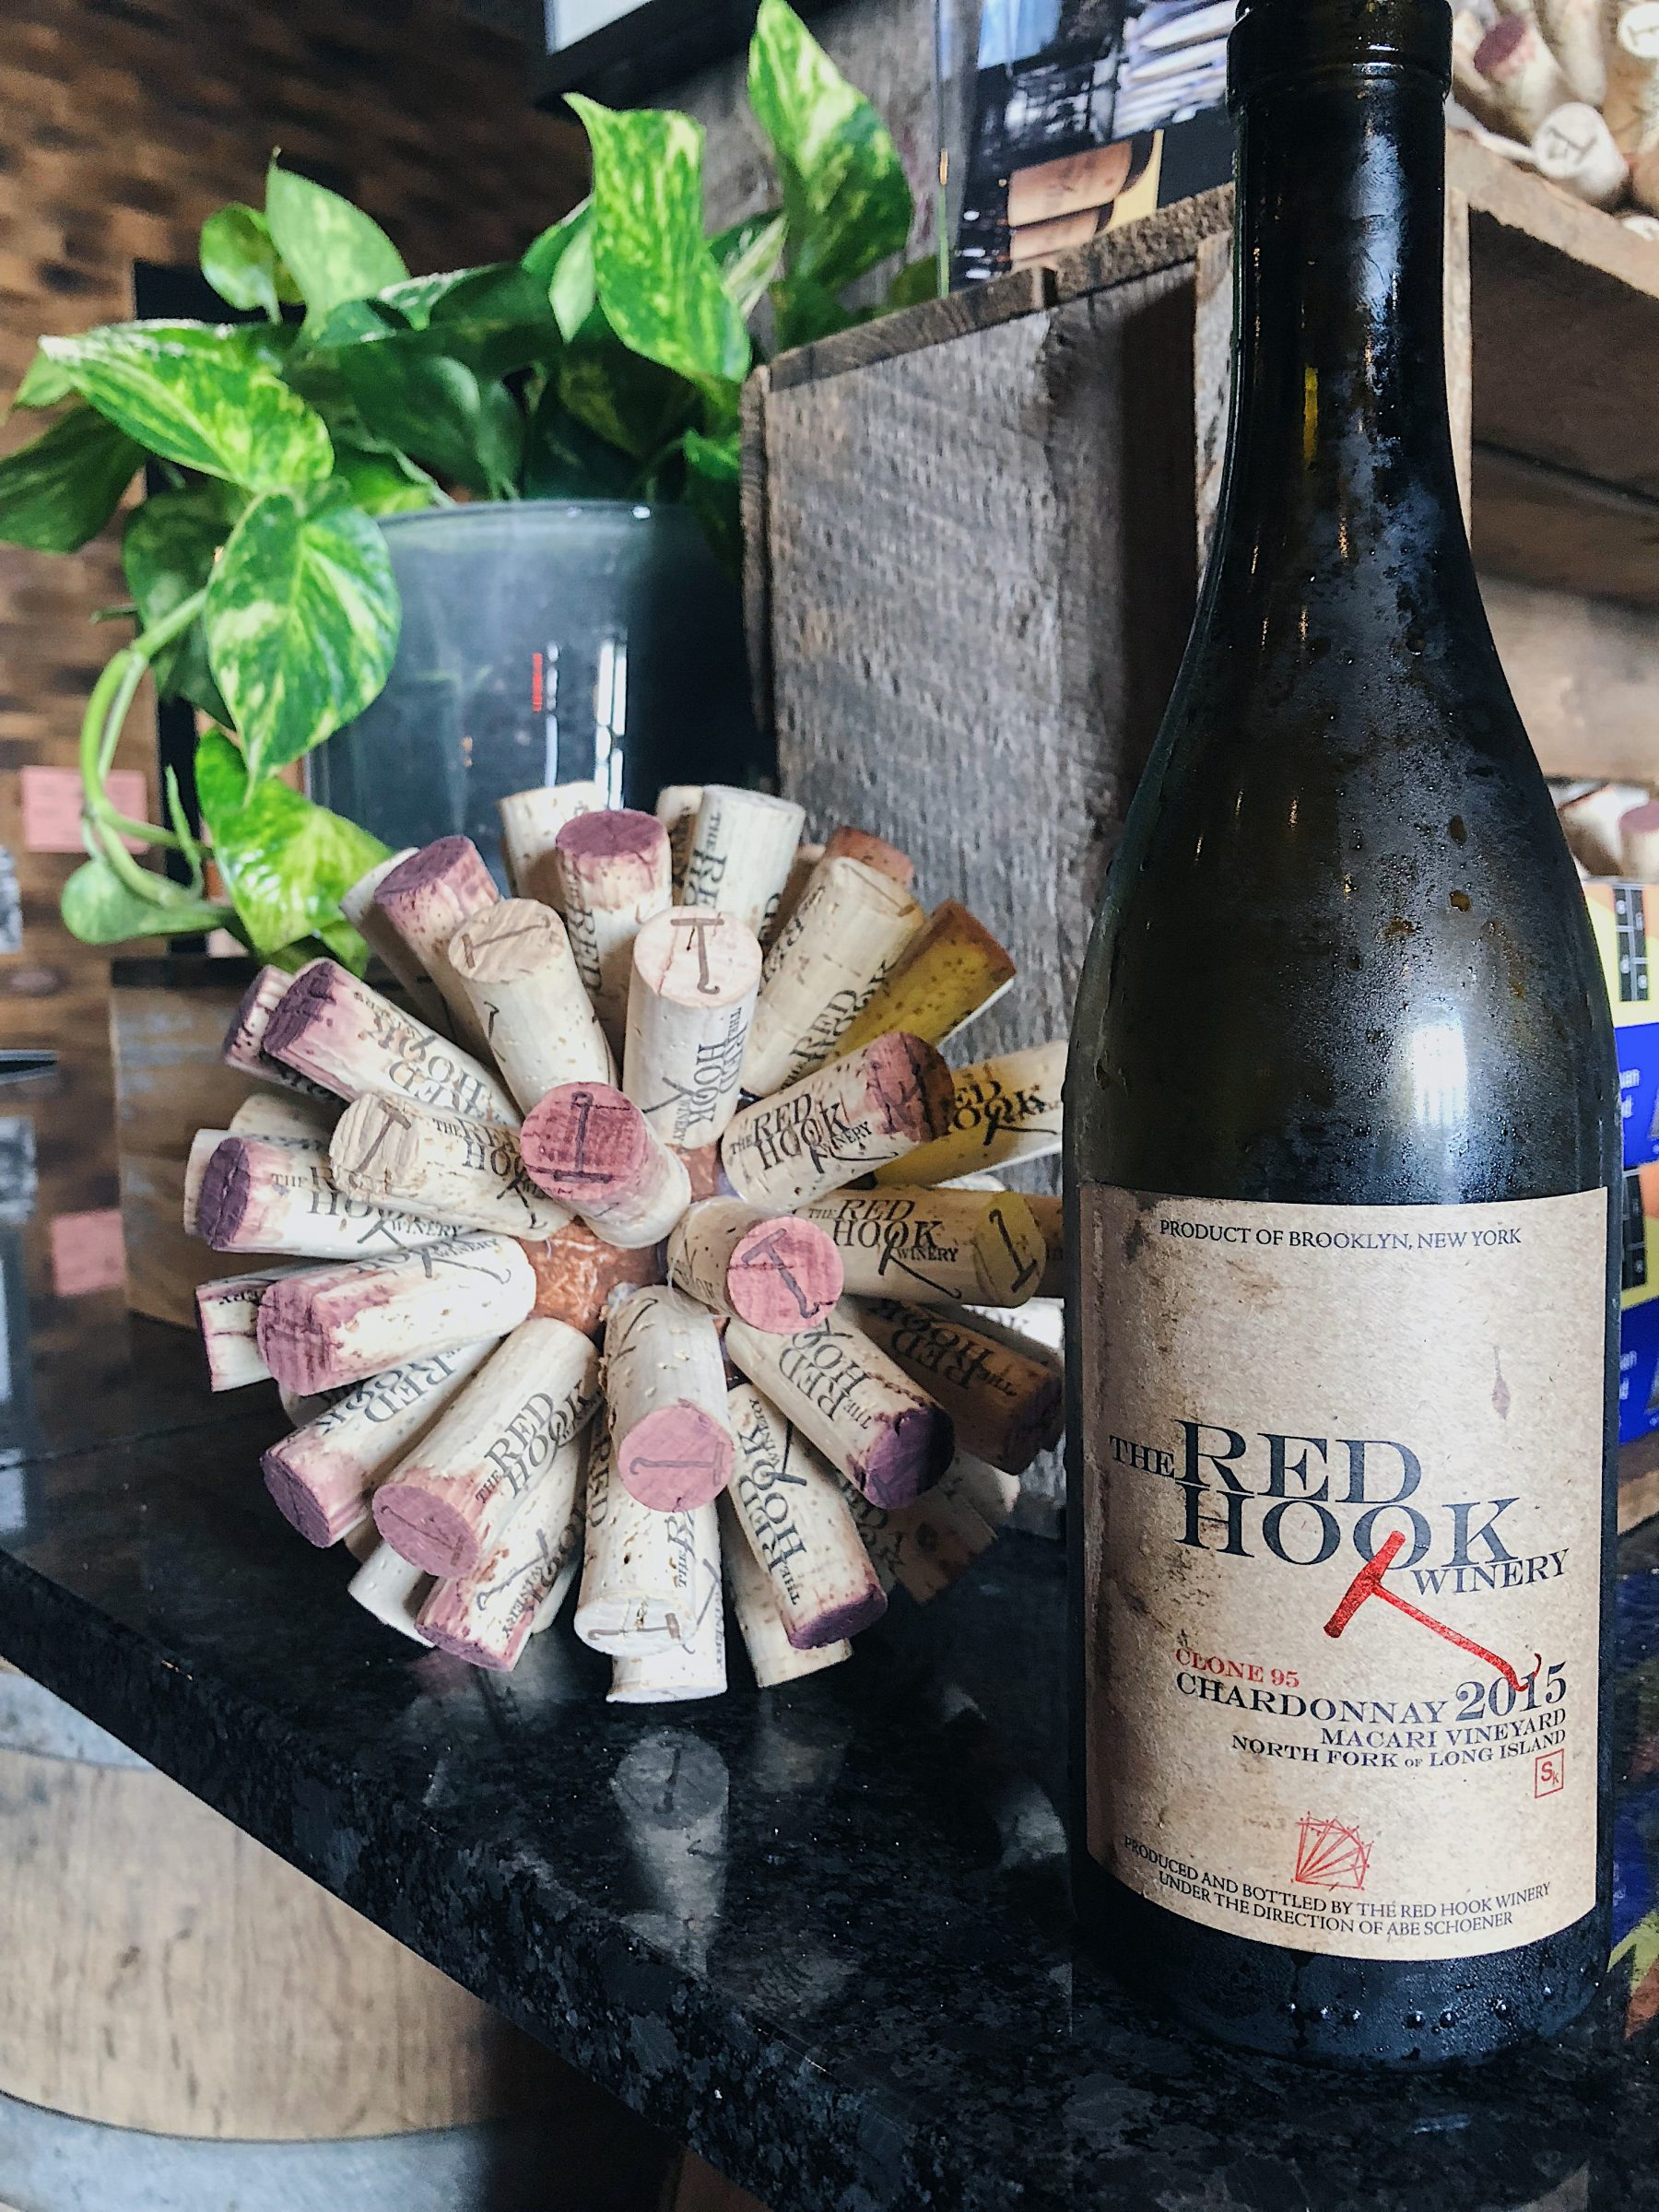 2015 Macari Vineyard Chardonnay by Abe Schoener